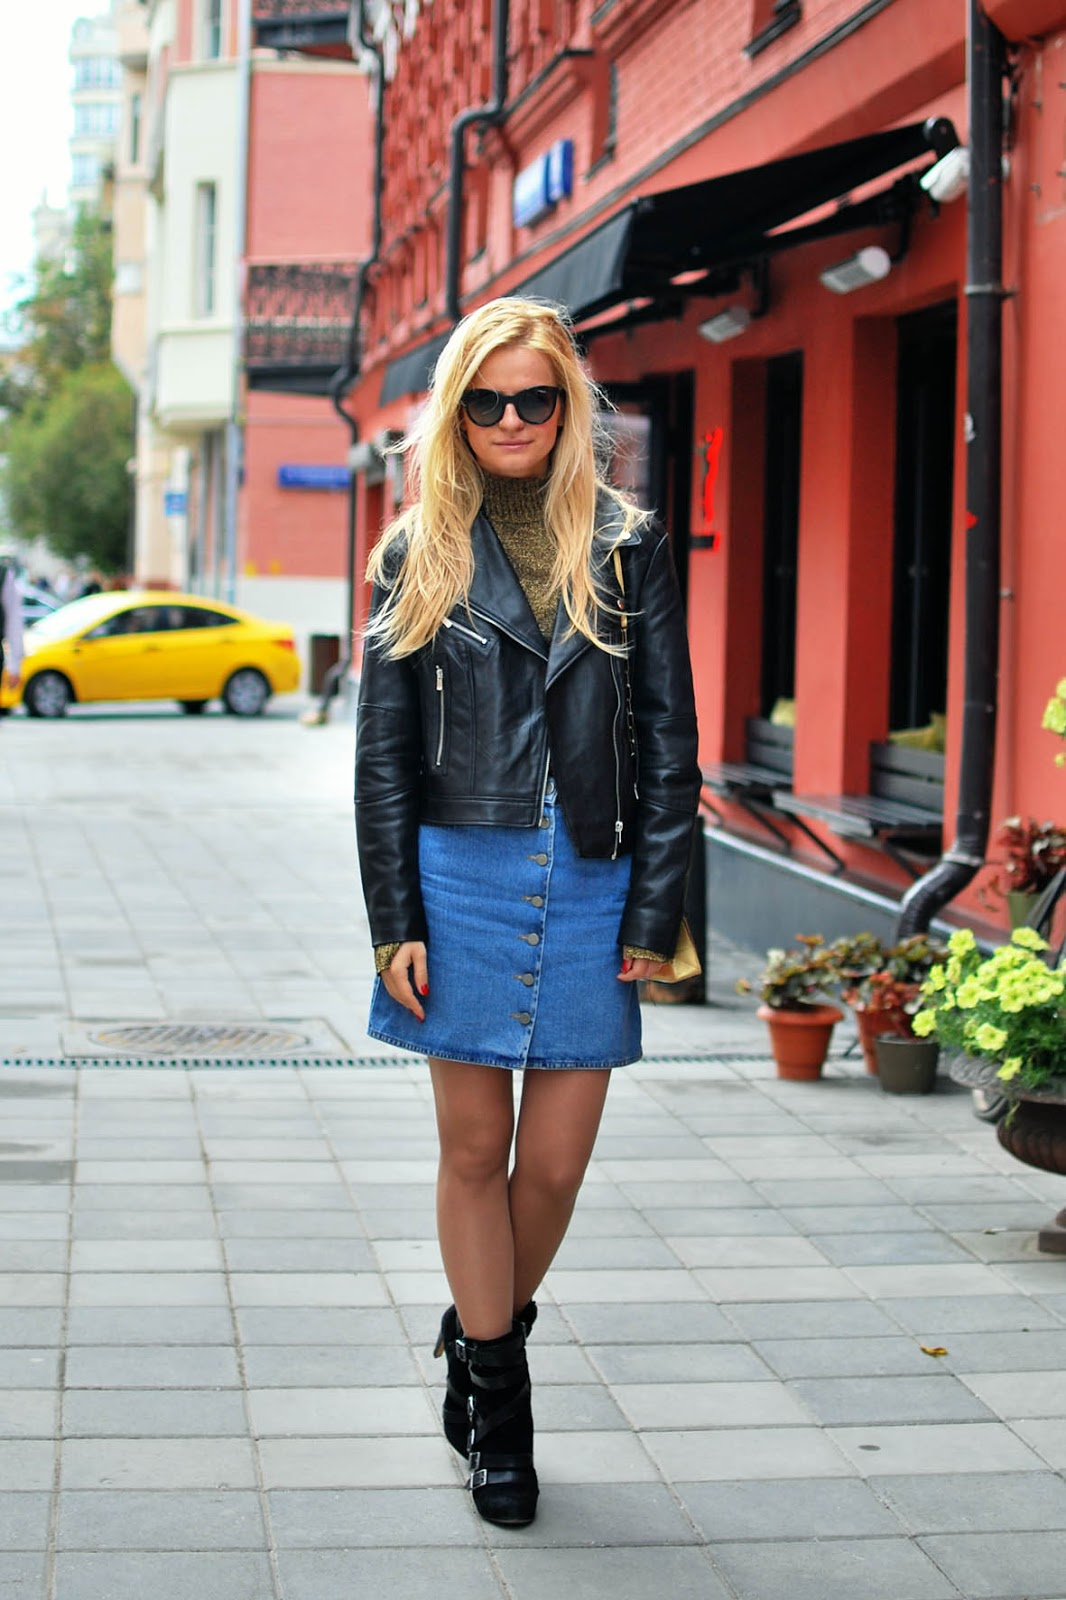 модные образы осени 2015,модные луки, autumn outfit 2015,button front denim skirt outfit